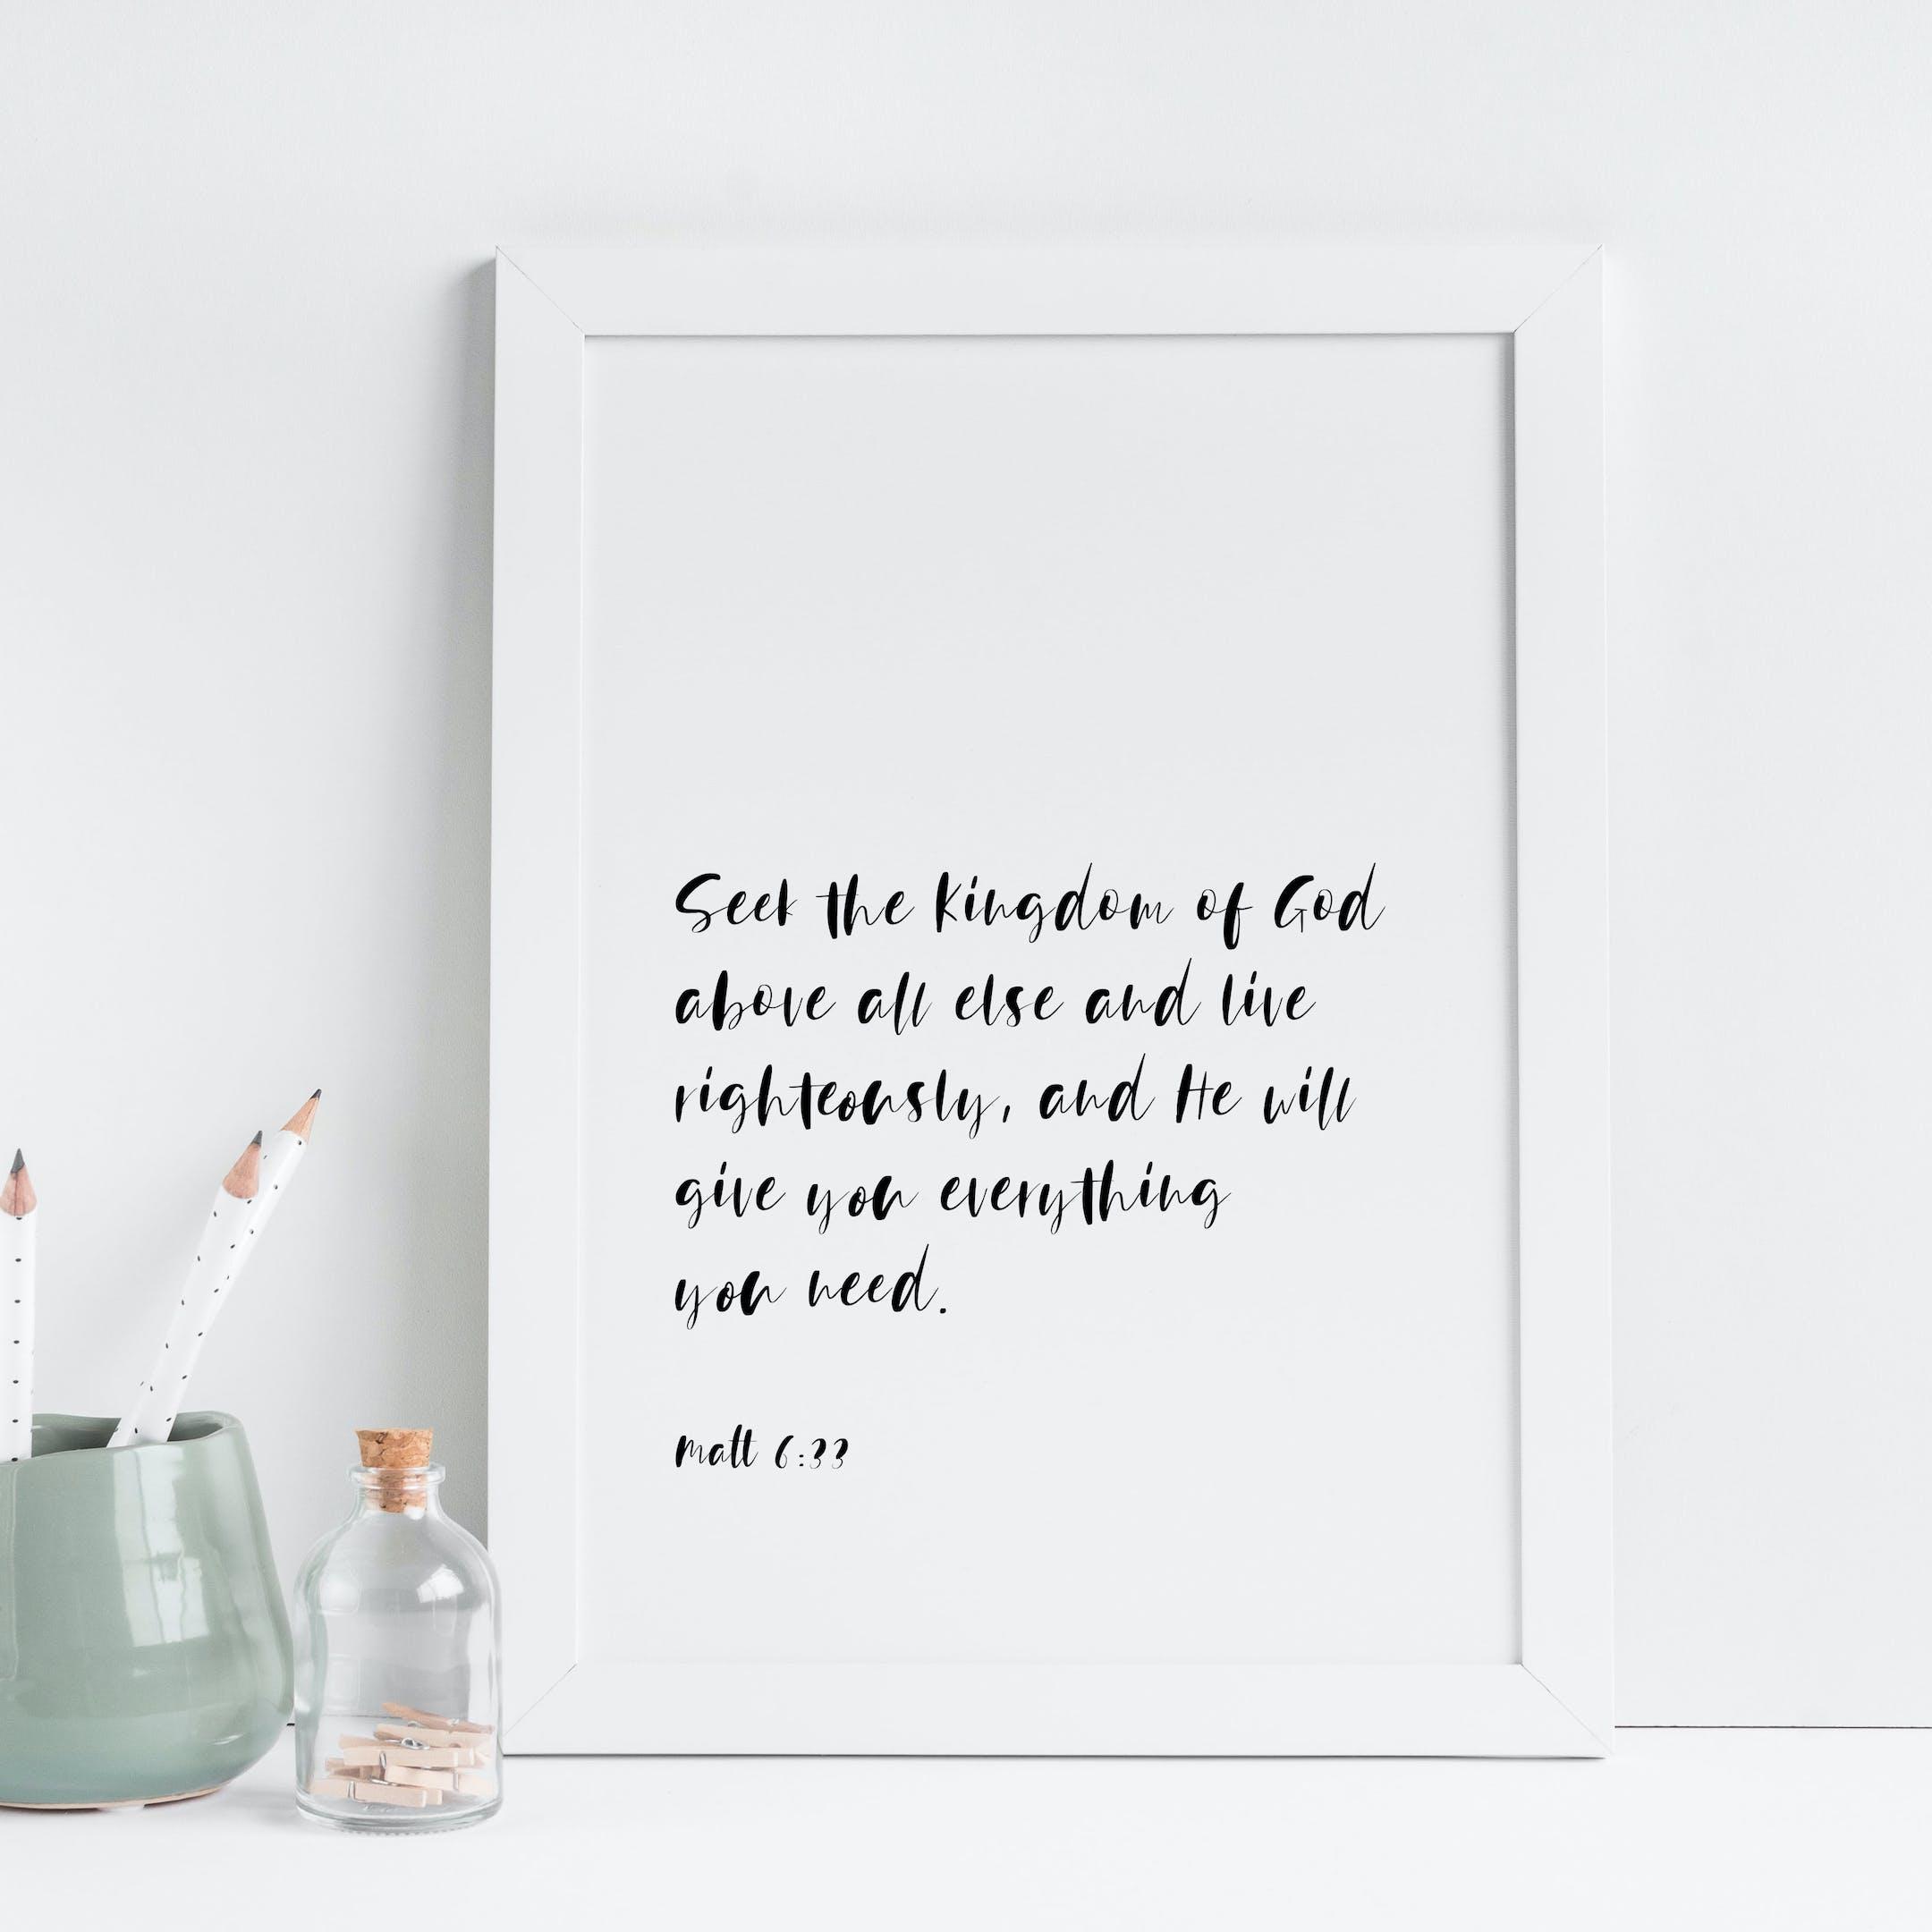 Seek The Kingdom Of God Above All Else Print - Matthew 6:33 - Christian Lettering Company